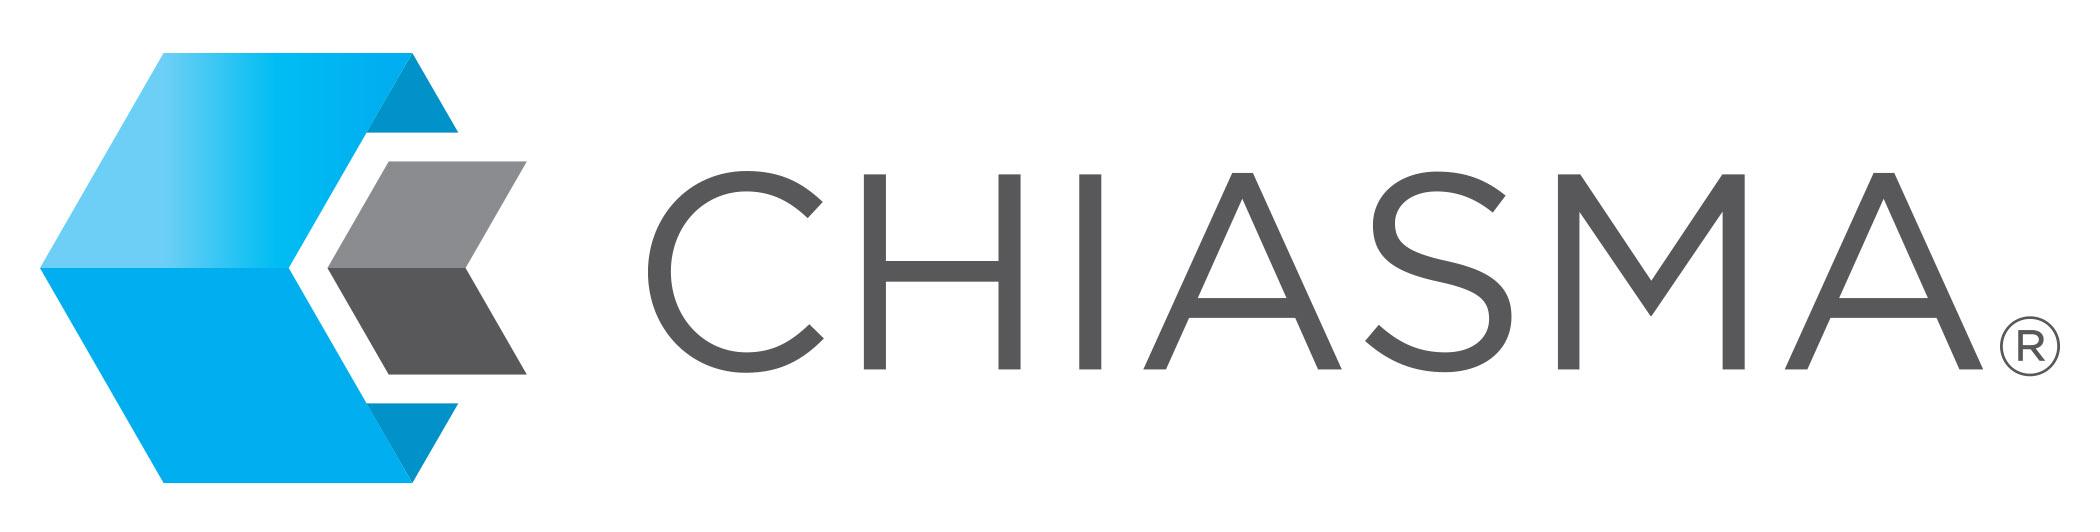 Chiasma logo